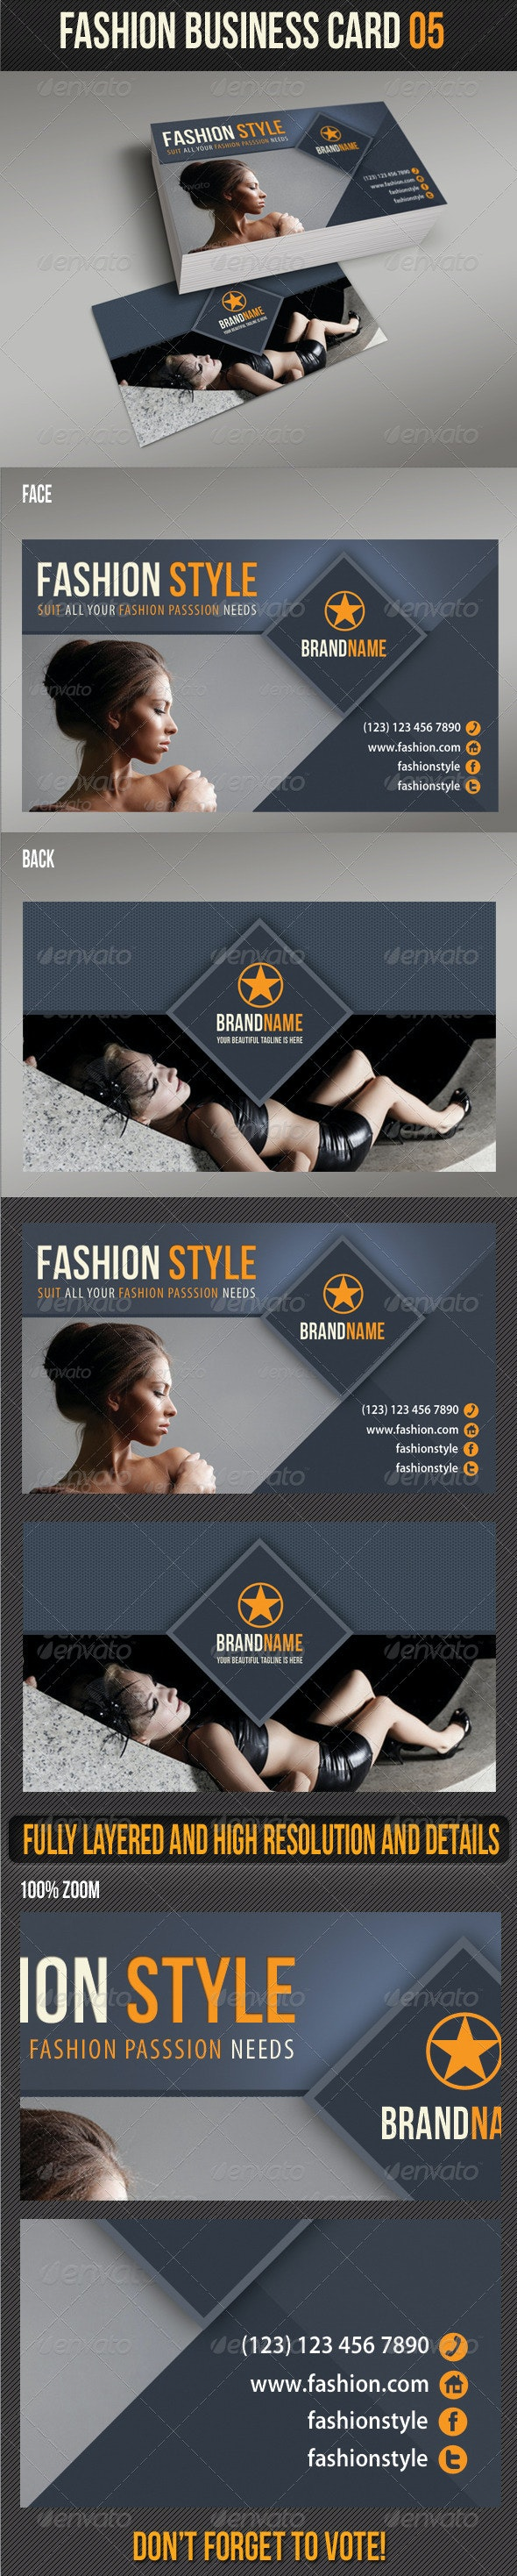 Fashion Business Card 05 - Creative Business Cards